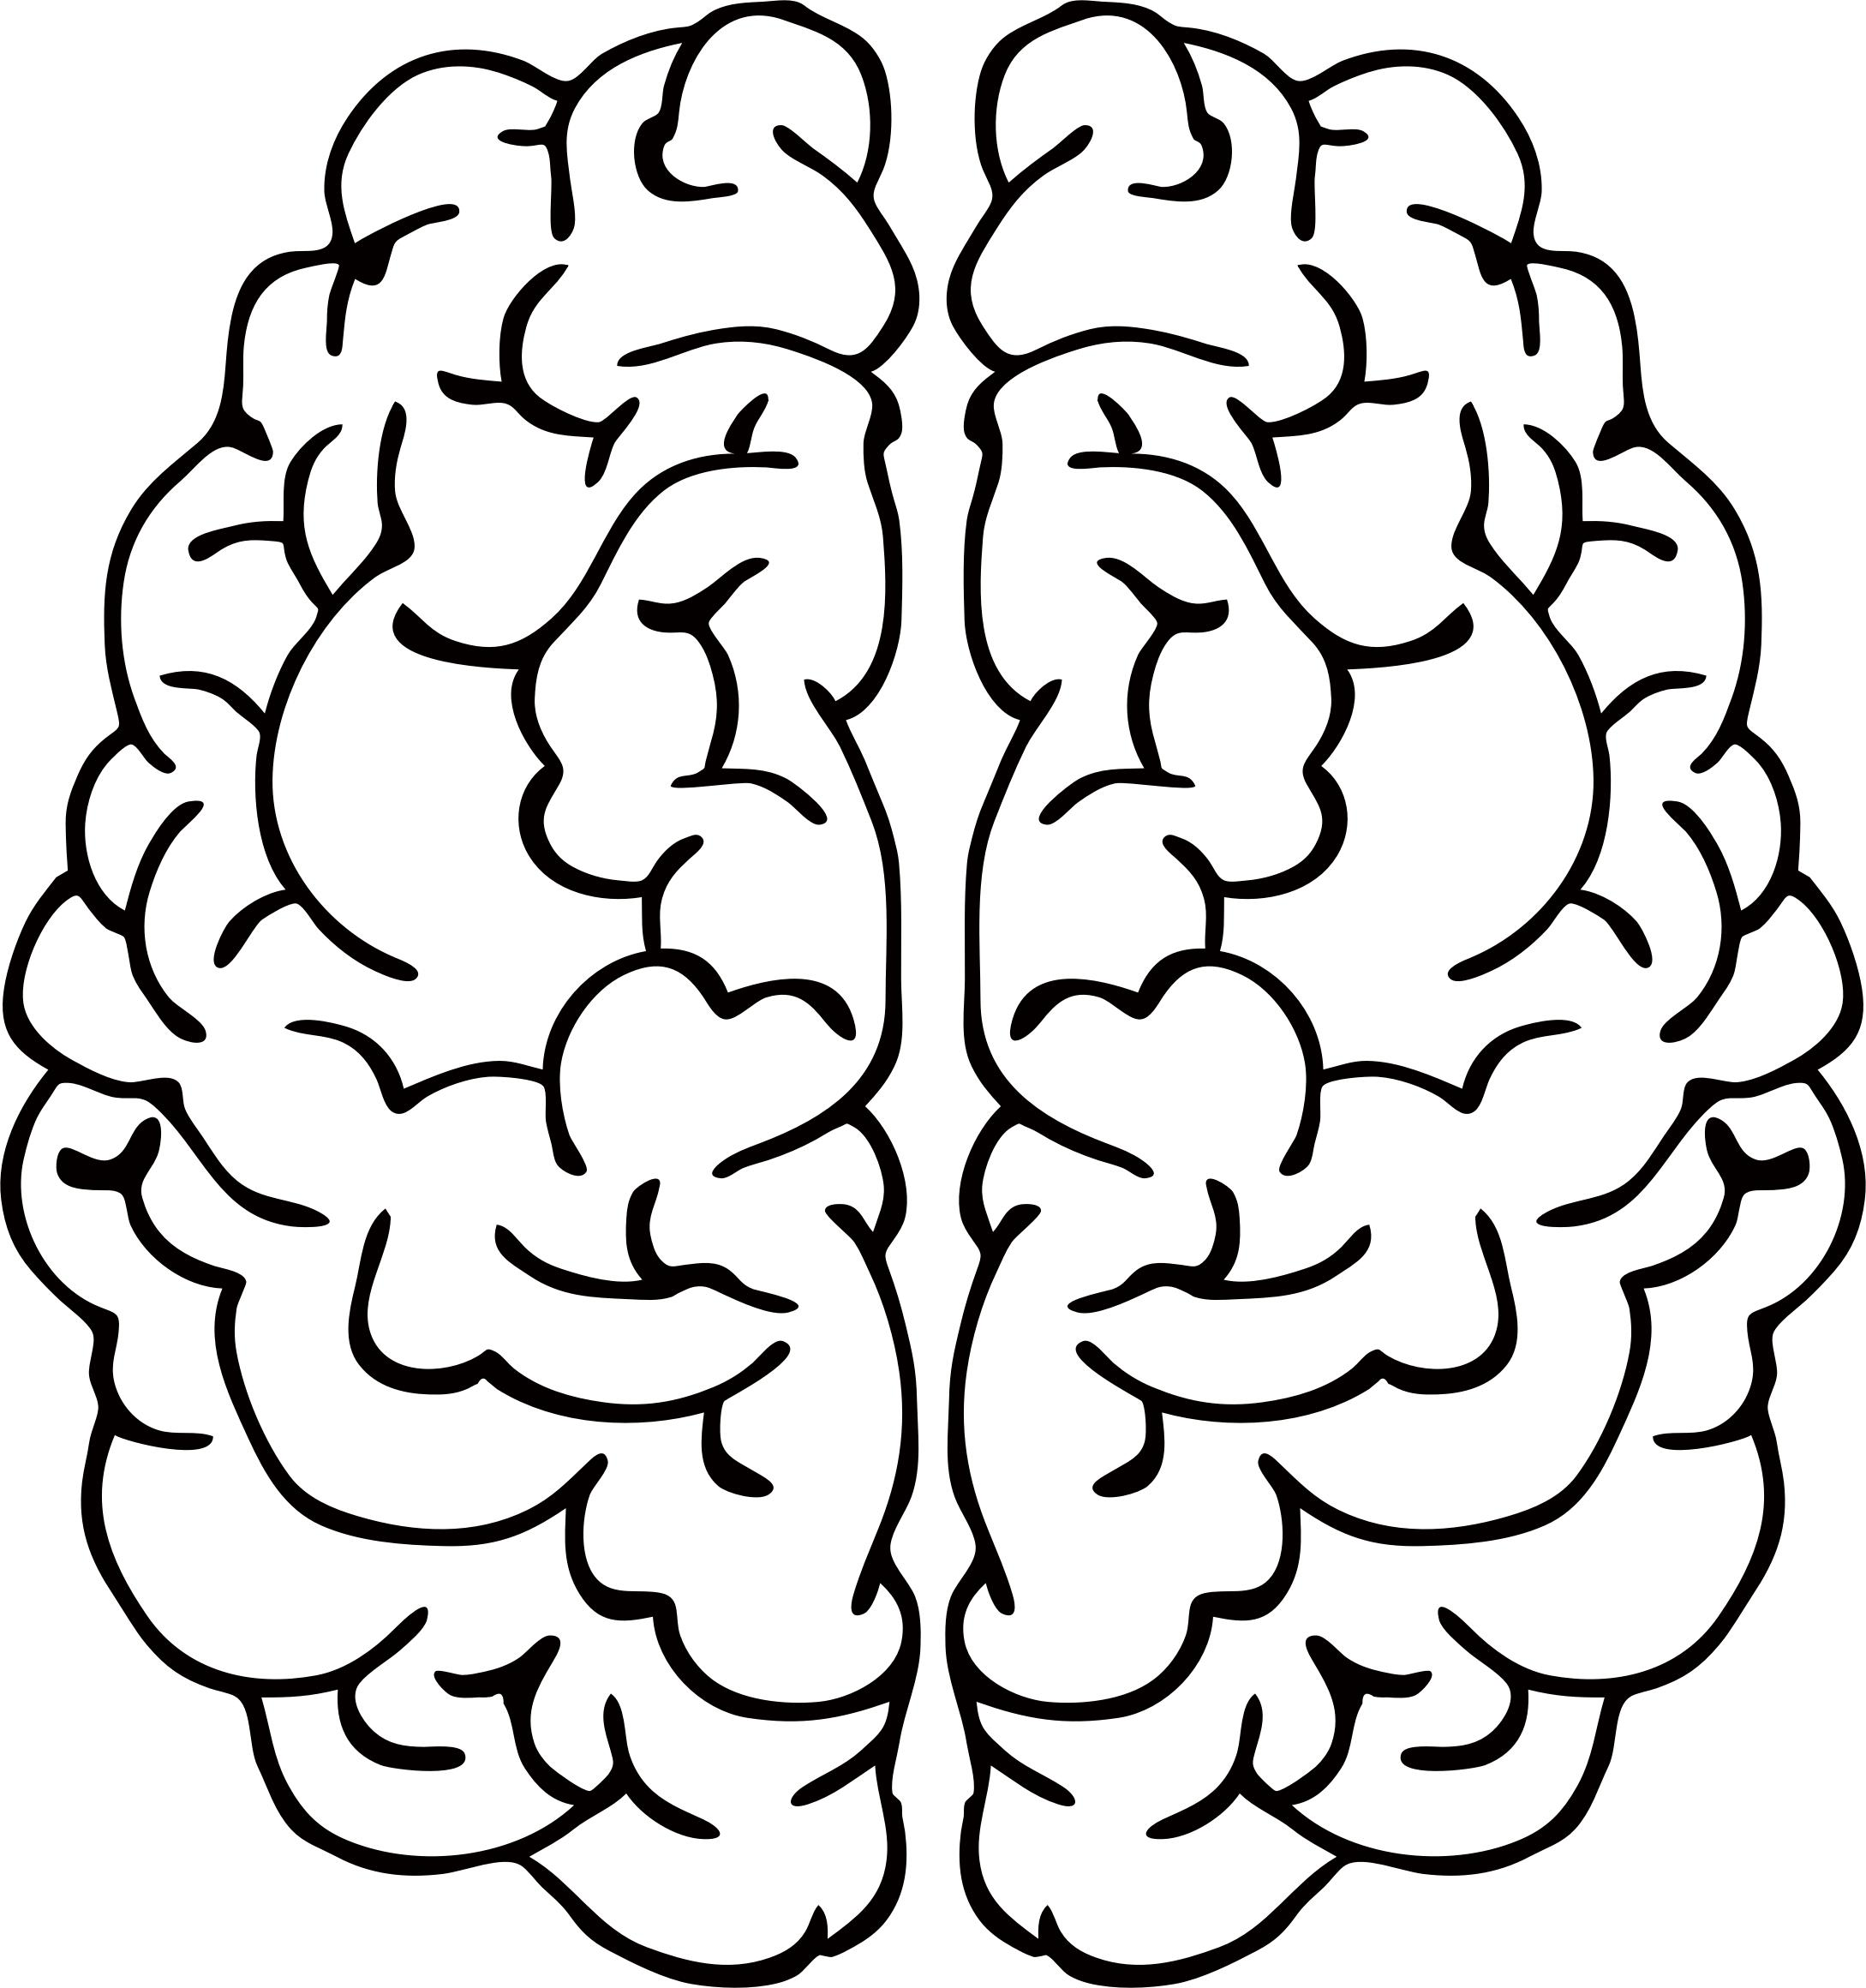 2178x2320 Free Brain Icons Png, Bra N Images